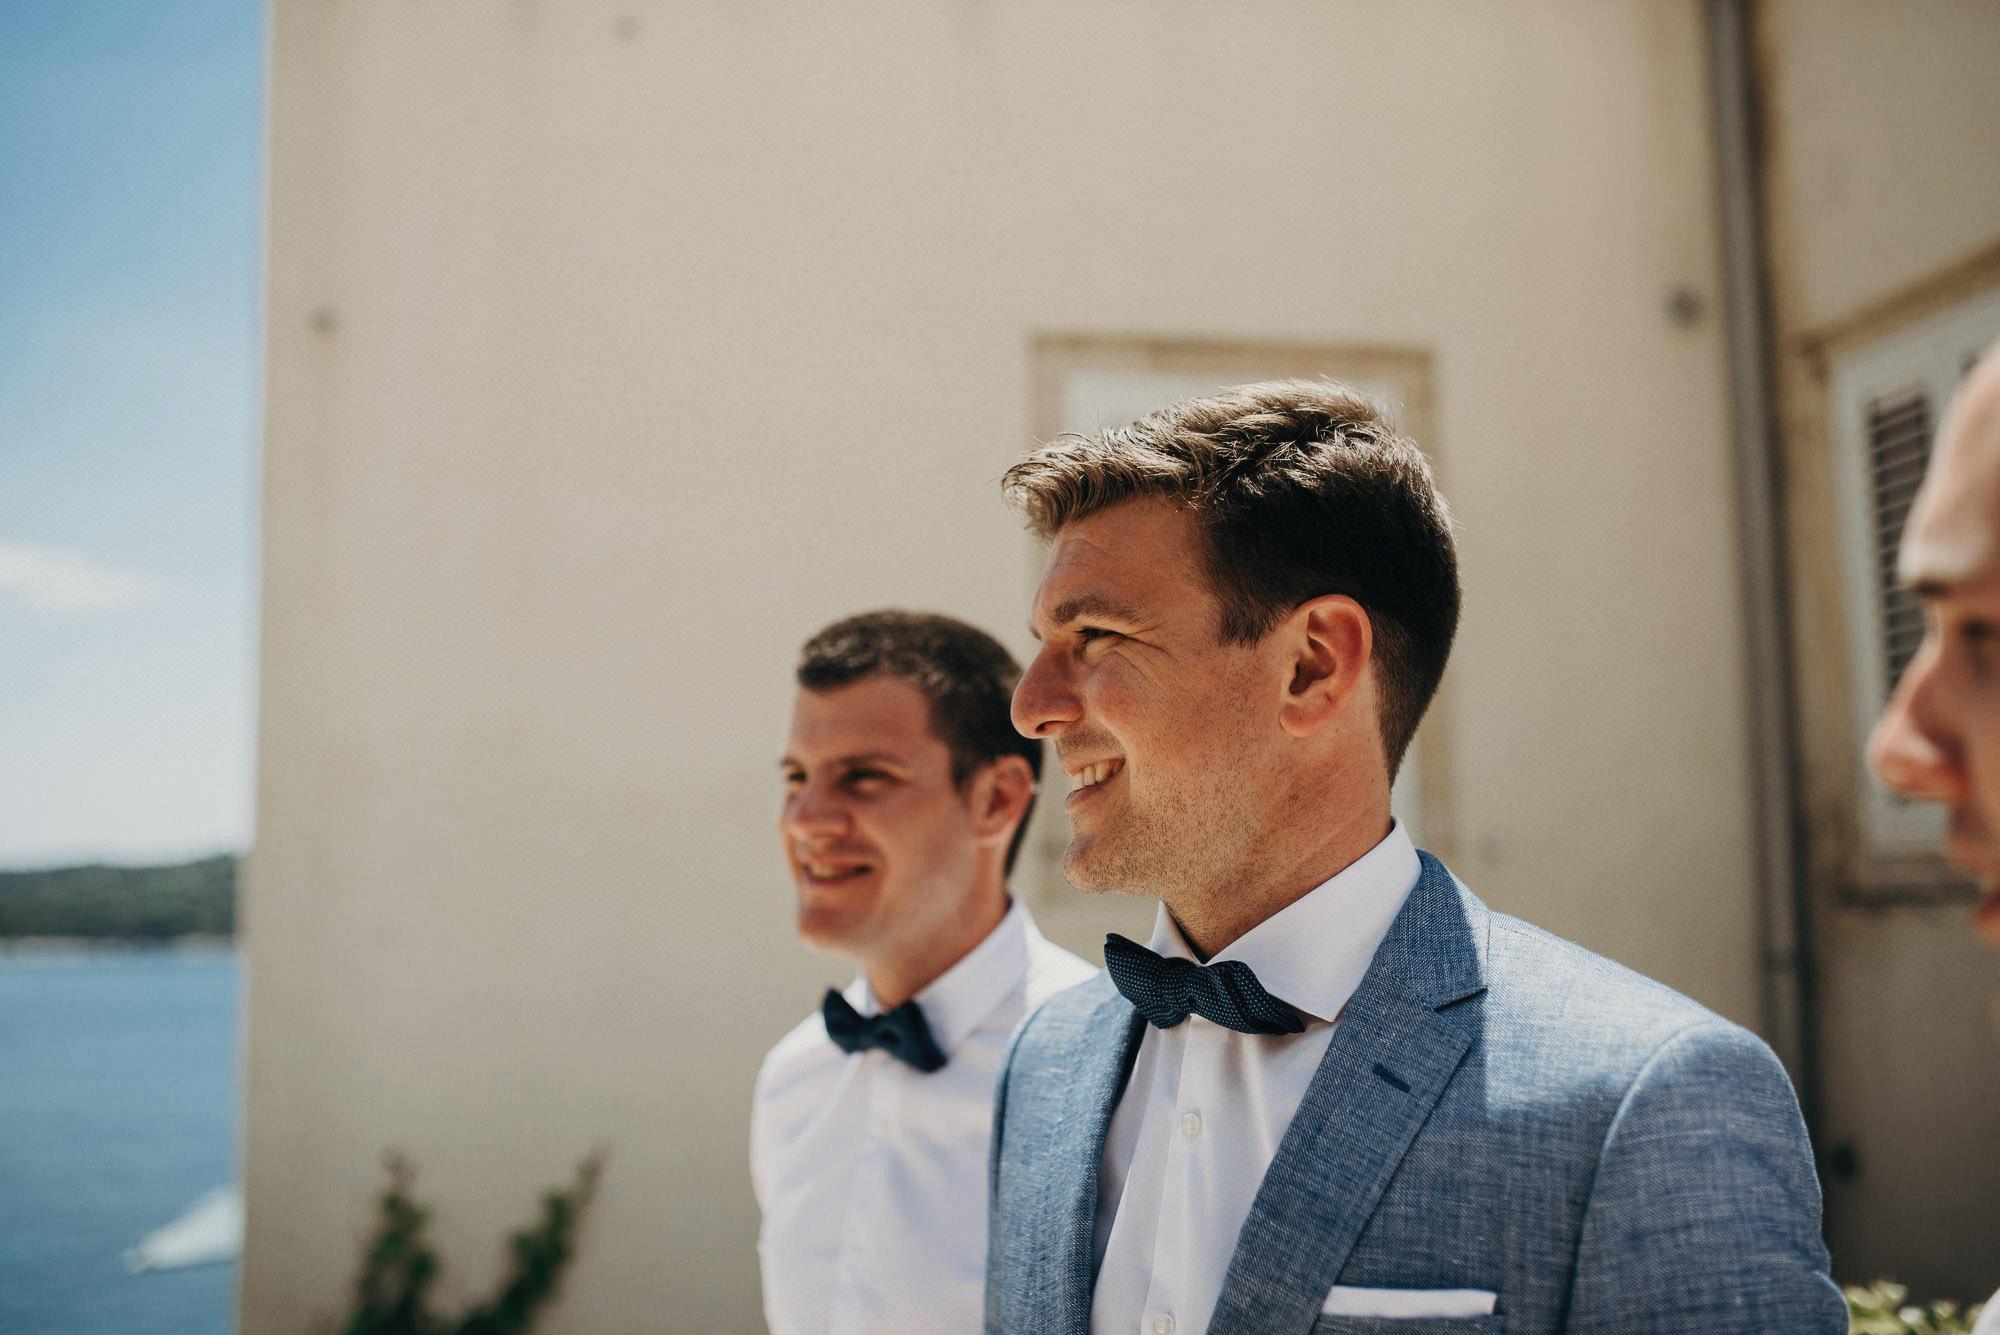 dubrovnik_croatia_wedding_photographer-jere_satamo-destination_weddings-024-web.jpg